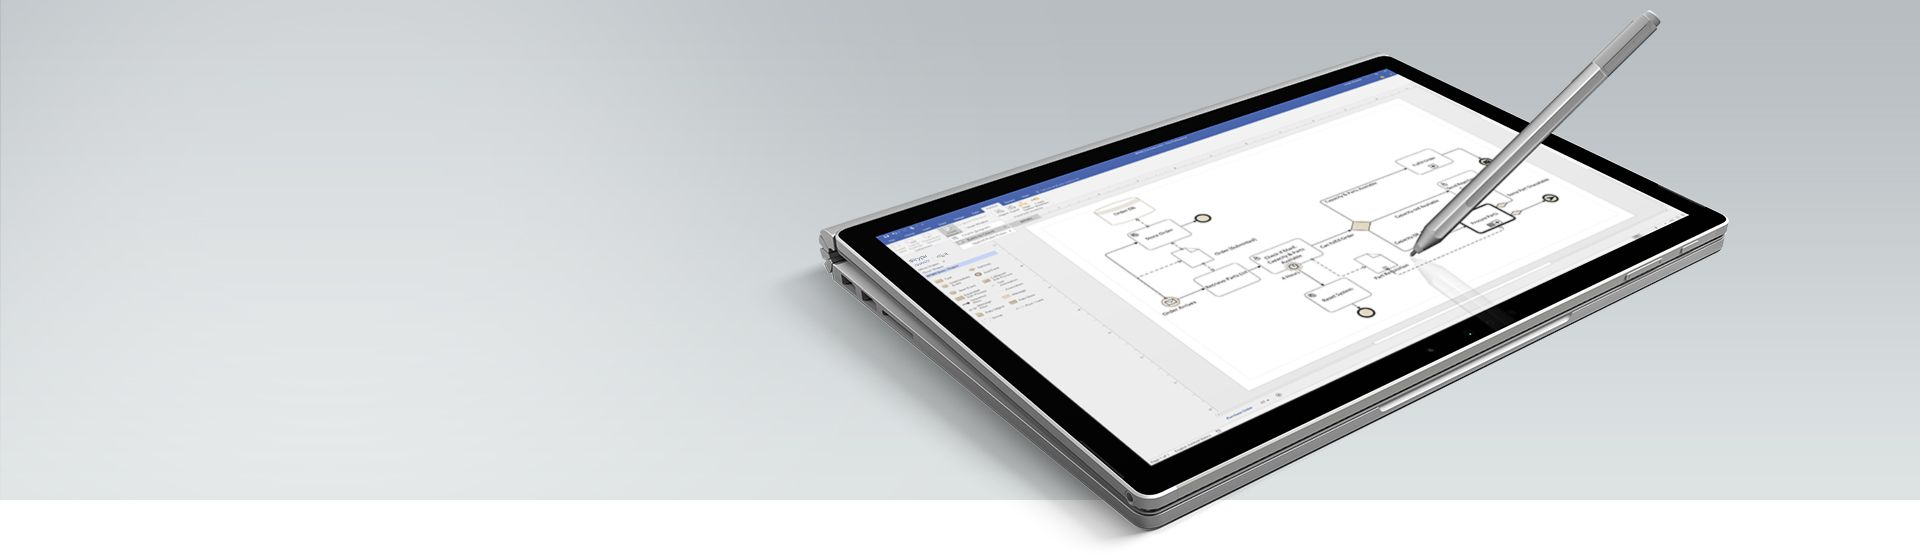 Планшет Surface зі схемою процесу у Visio